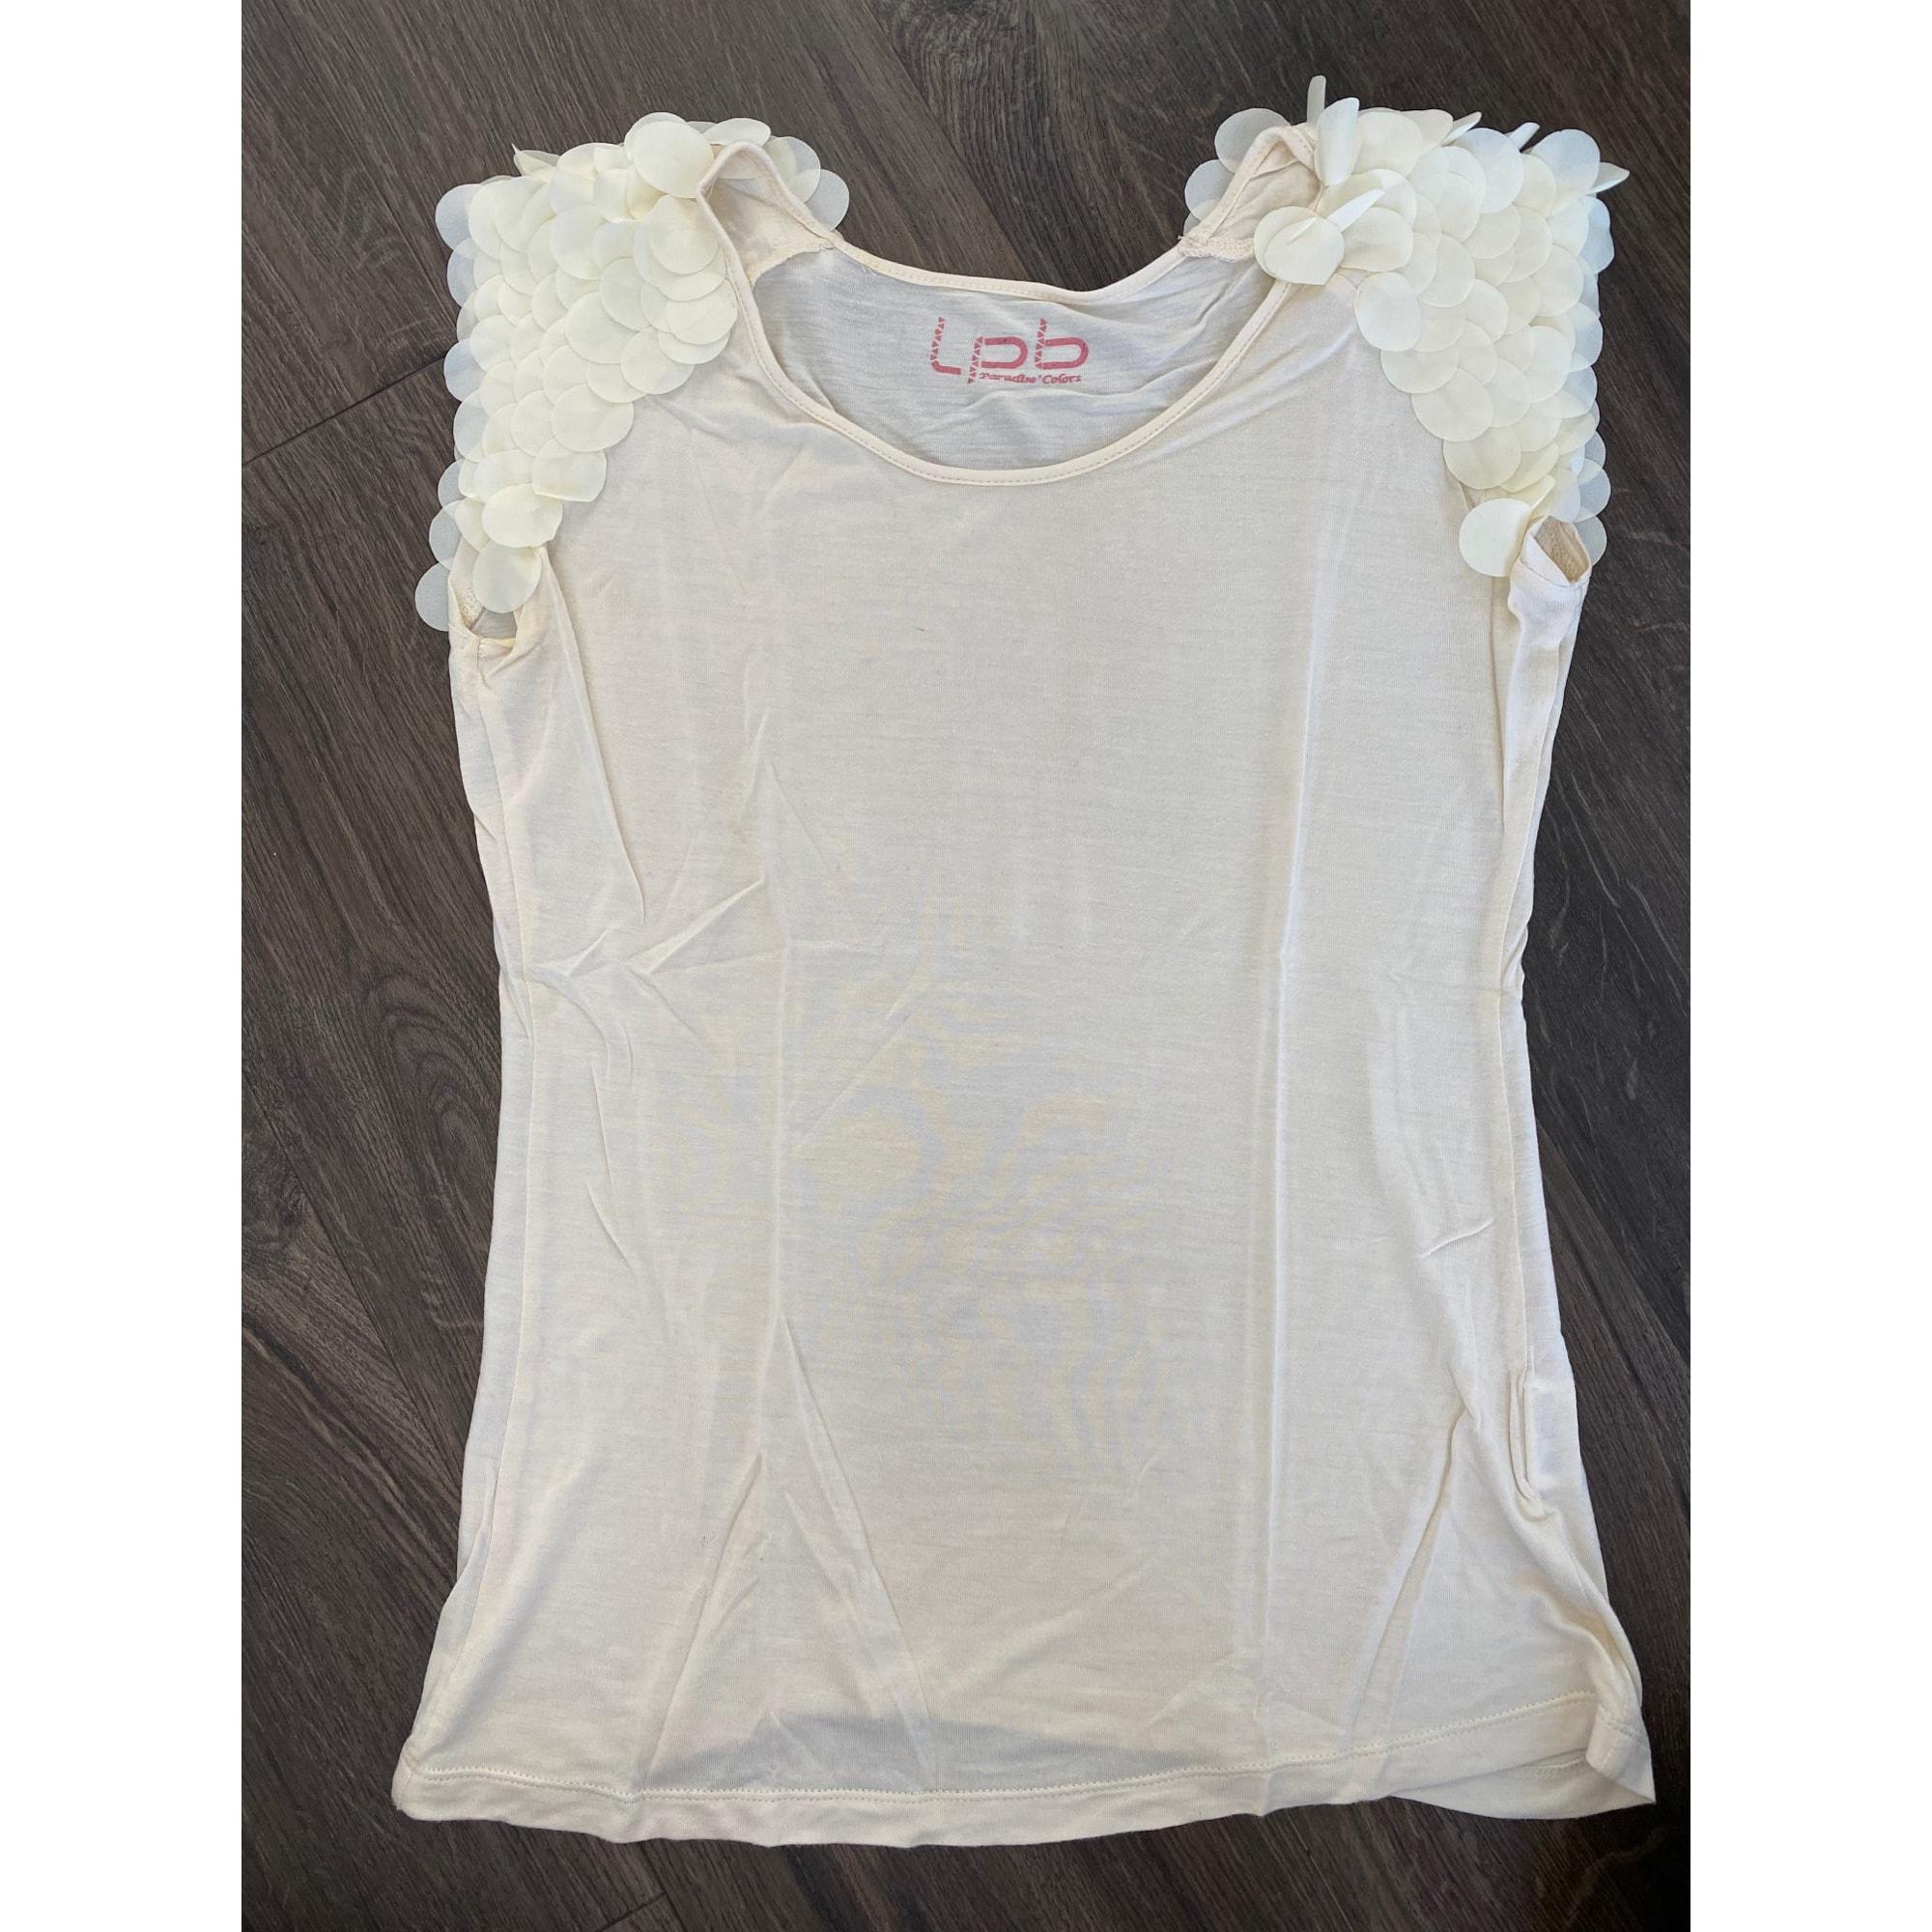 Top, tee-shirt LPB LES P'TITES BOMBES Blanc, blanc cassé, écru